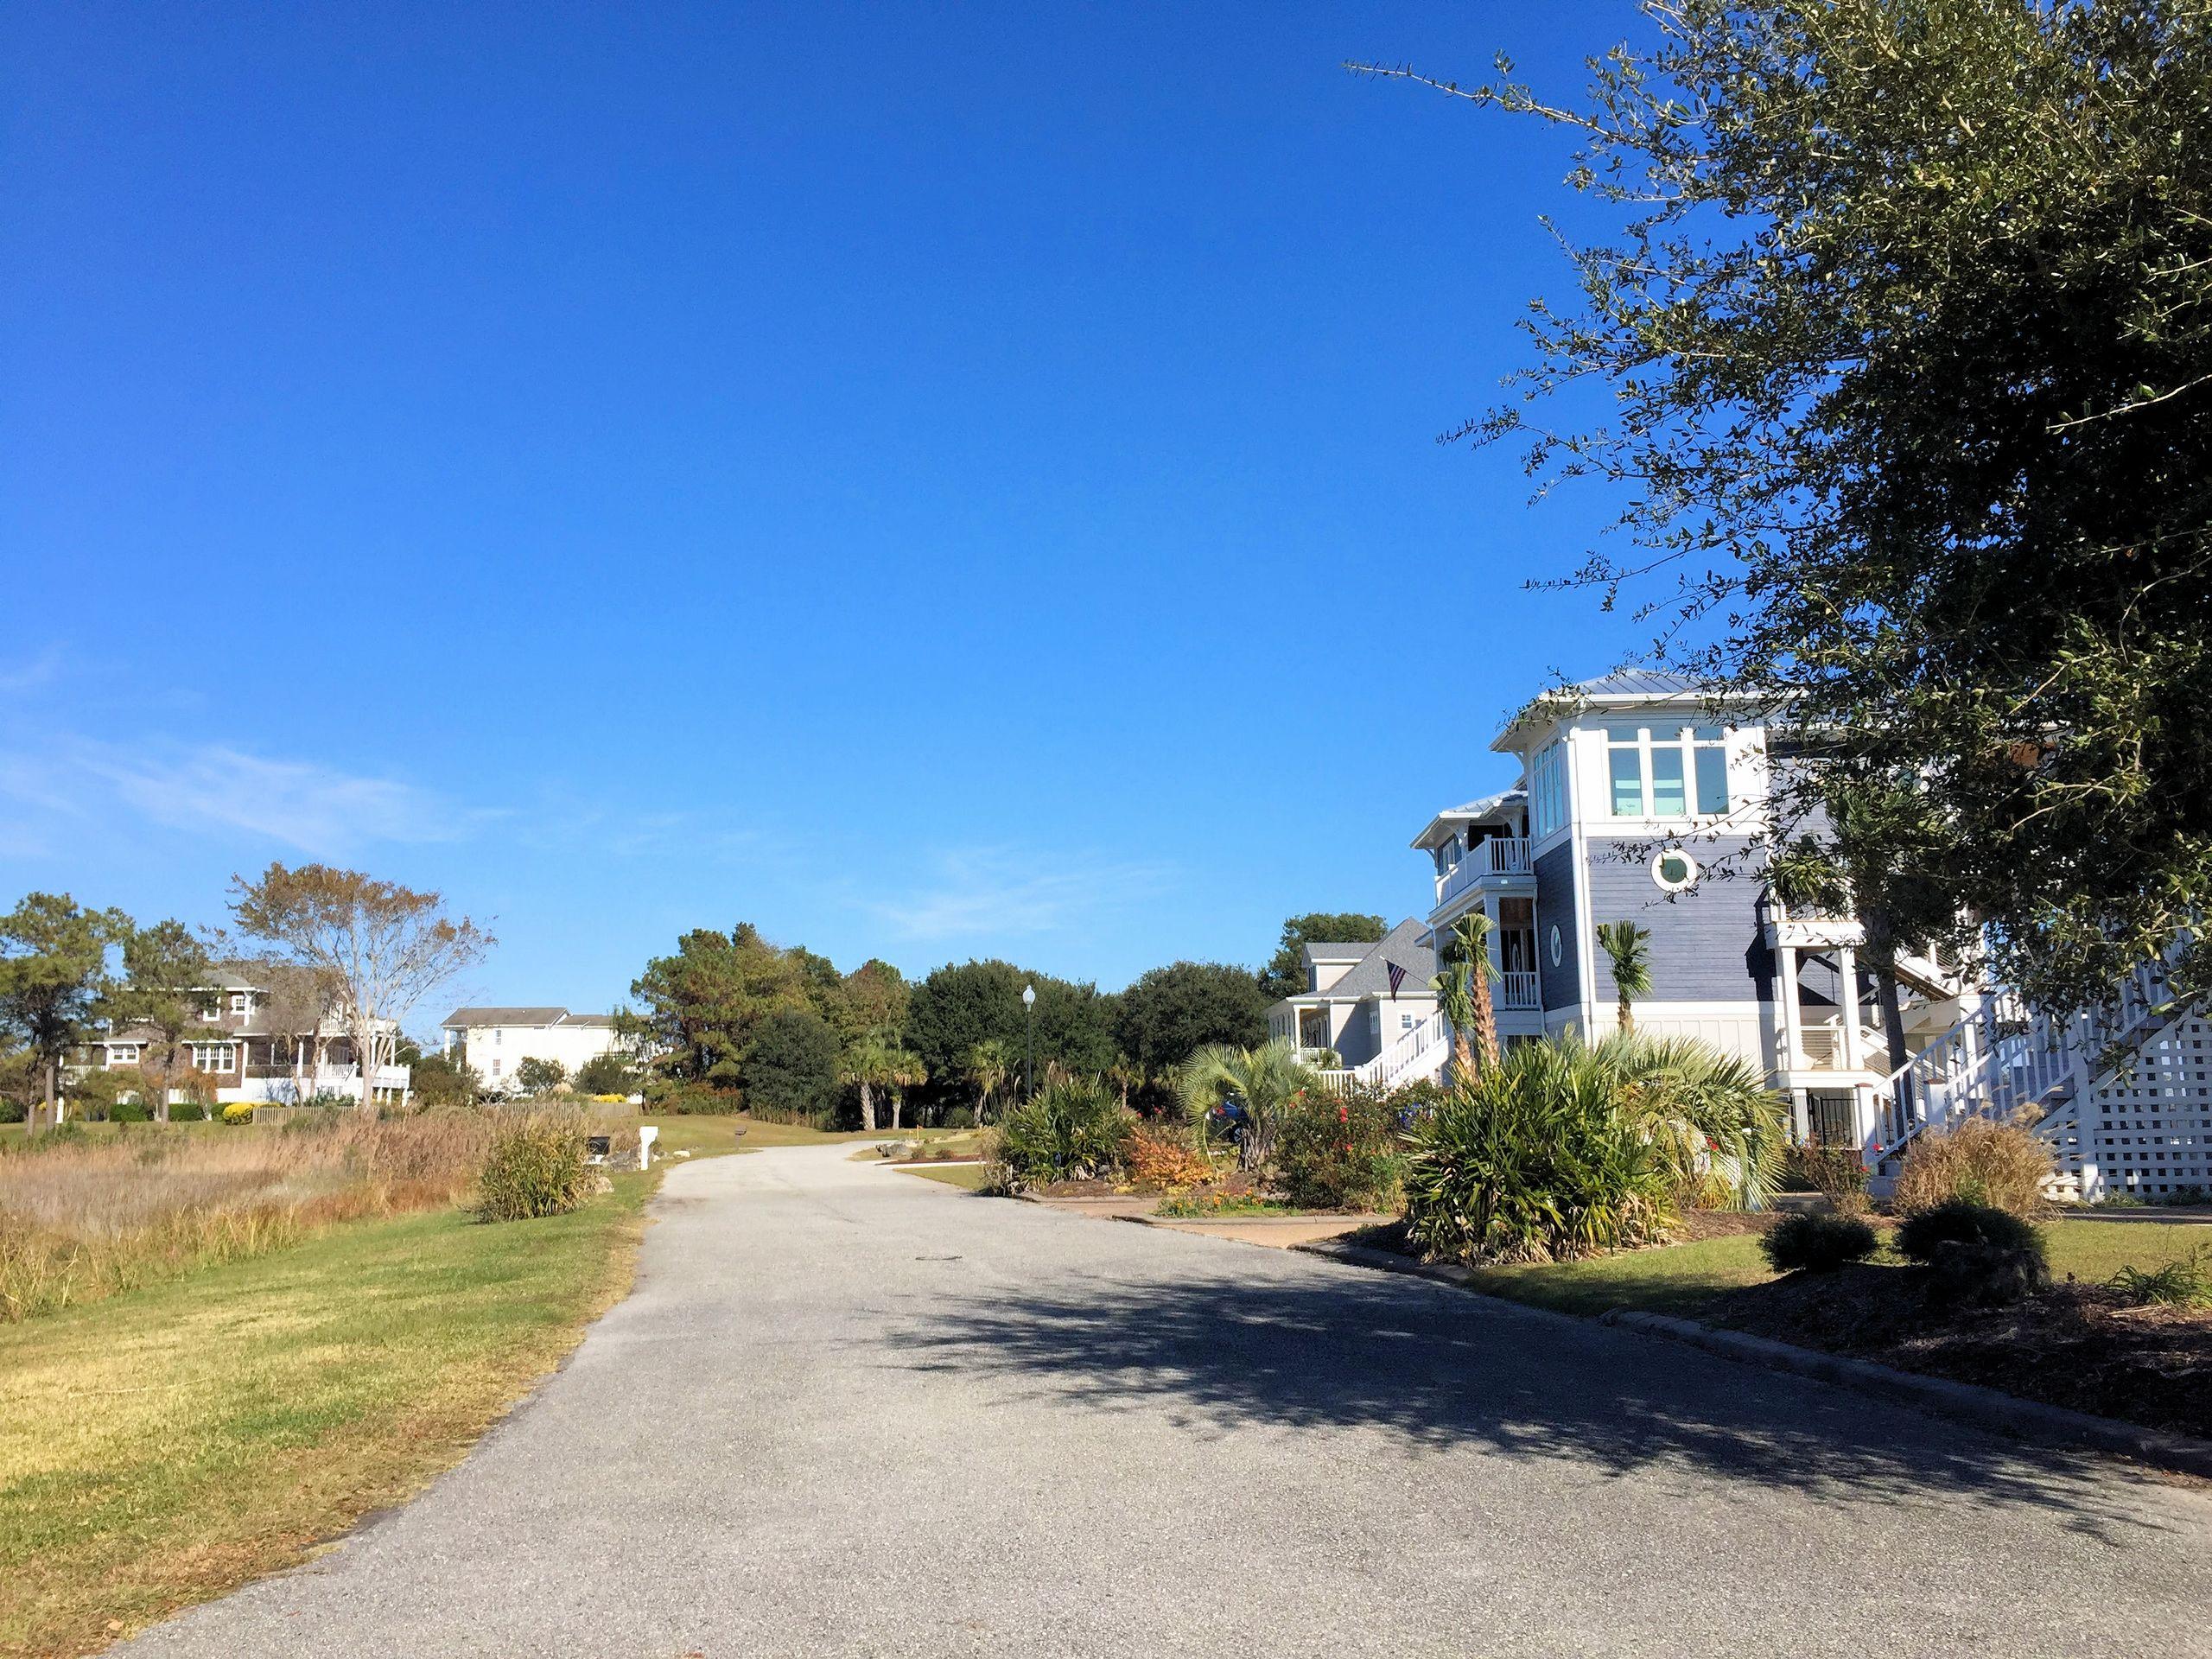 Harbour Village Marina - Streetscape - The Cameron Team